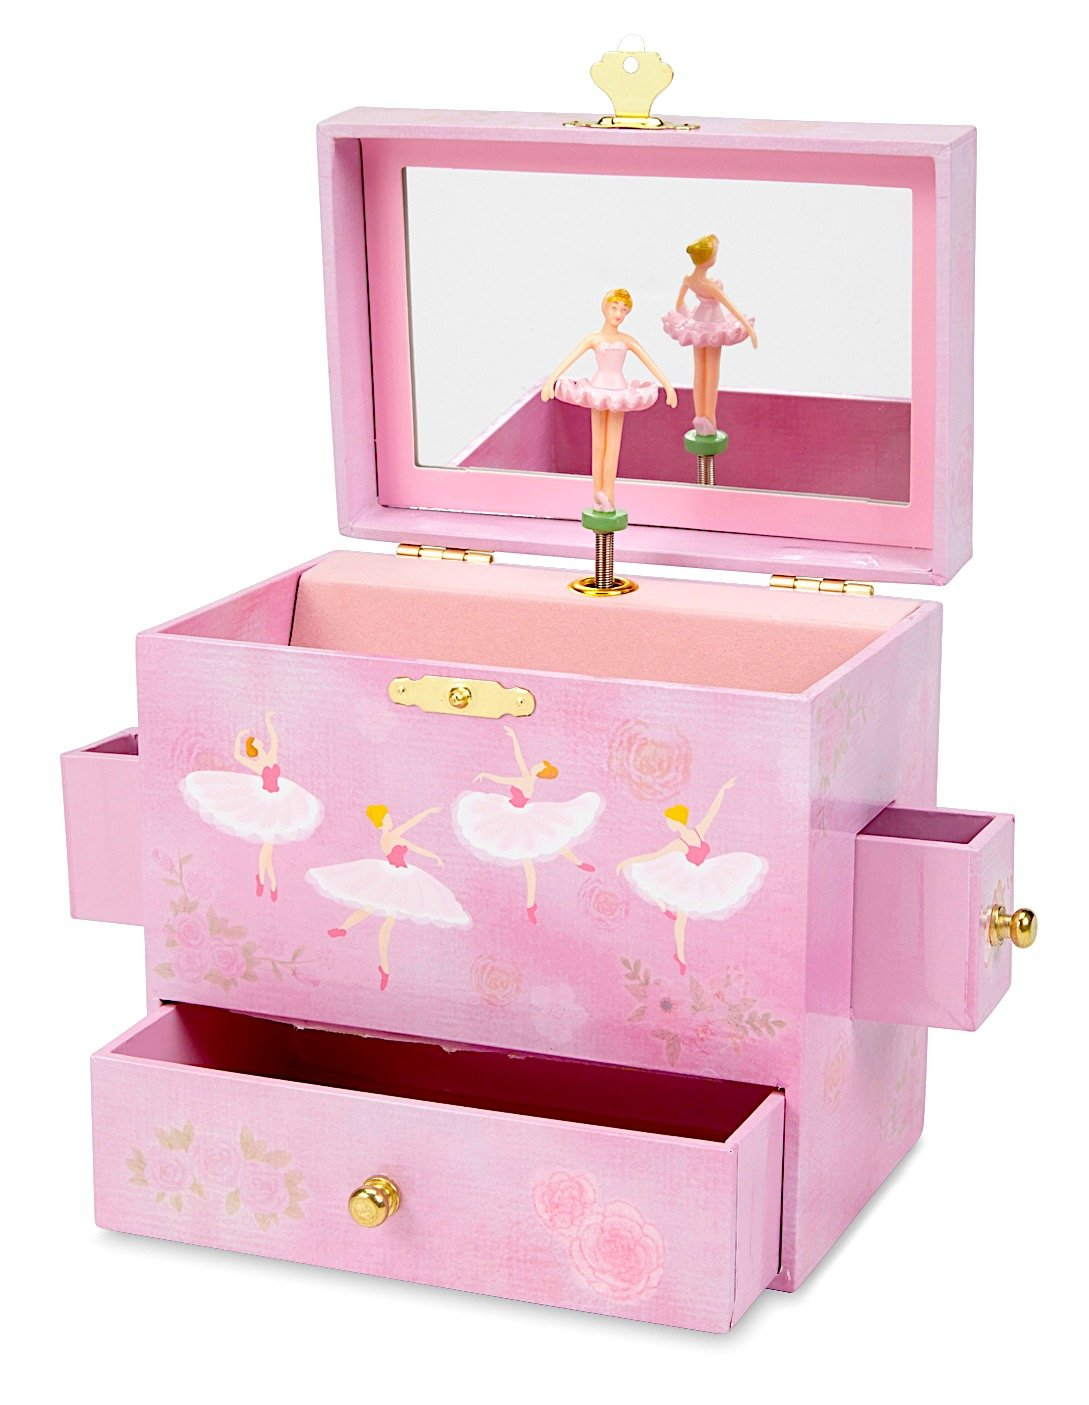 JewelKeeper Ballerina Musical Jewelry Box with 3 Drawers, Pink Rose Design, Swan Lake Tune